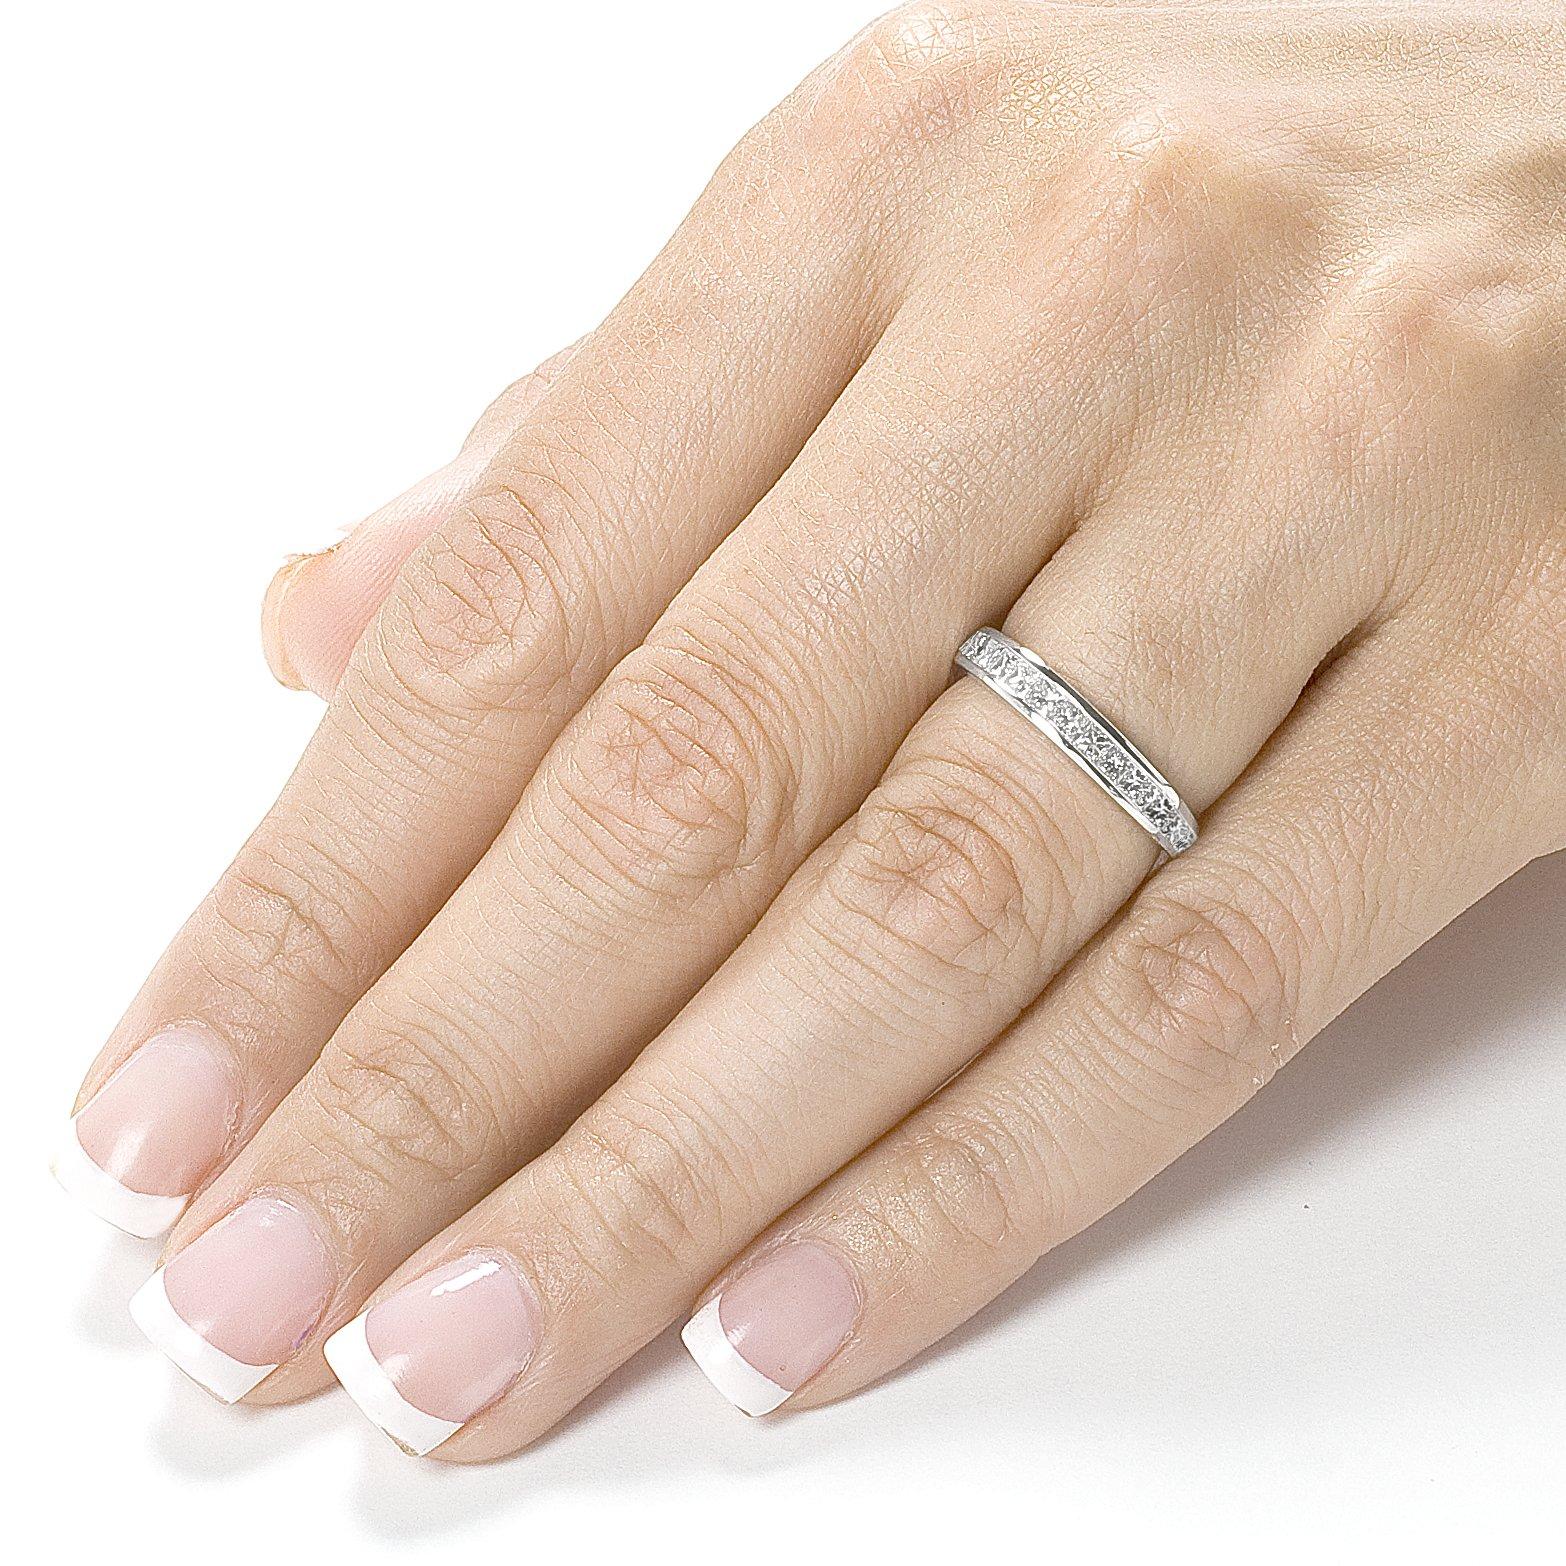 Diamond Eternity Wedding Band 2 carat (ctw) in 14K Gold, Size 7, Rose Gold